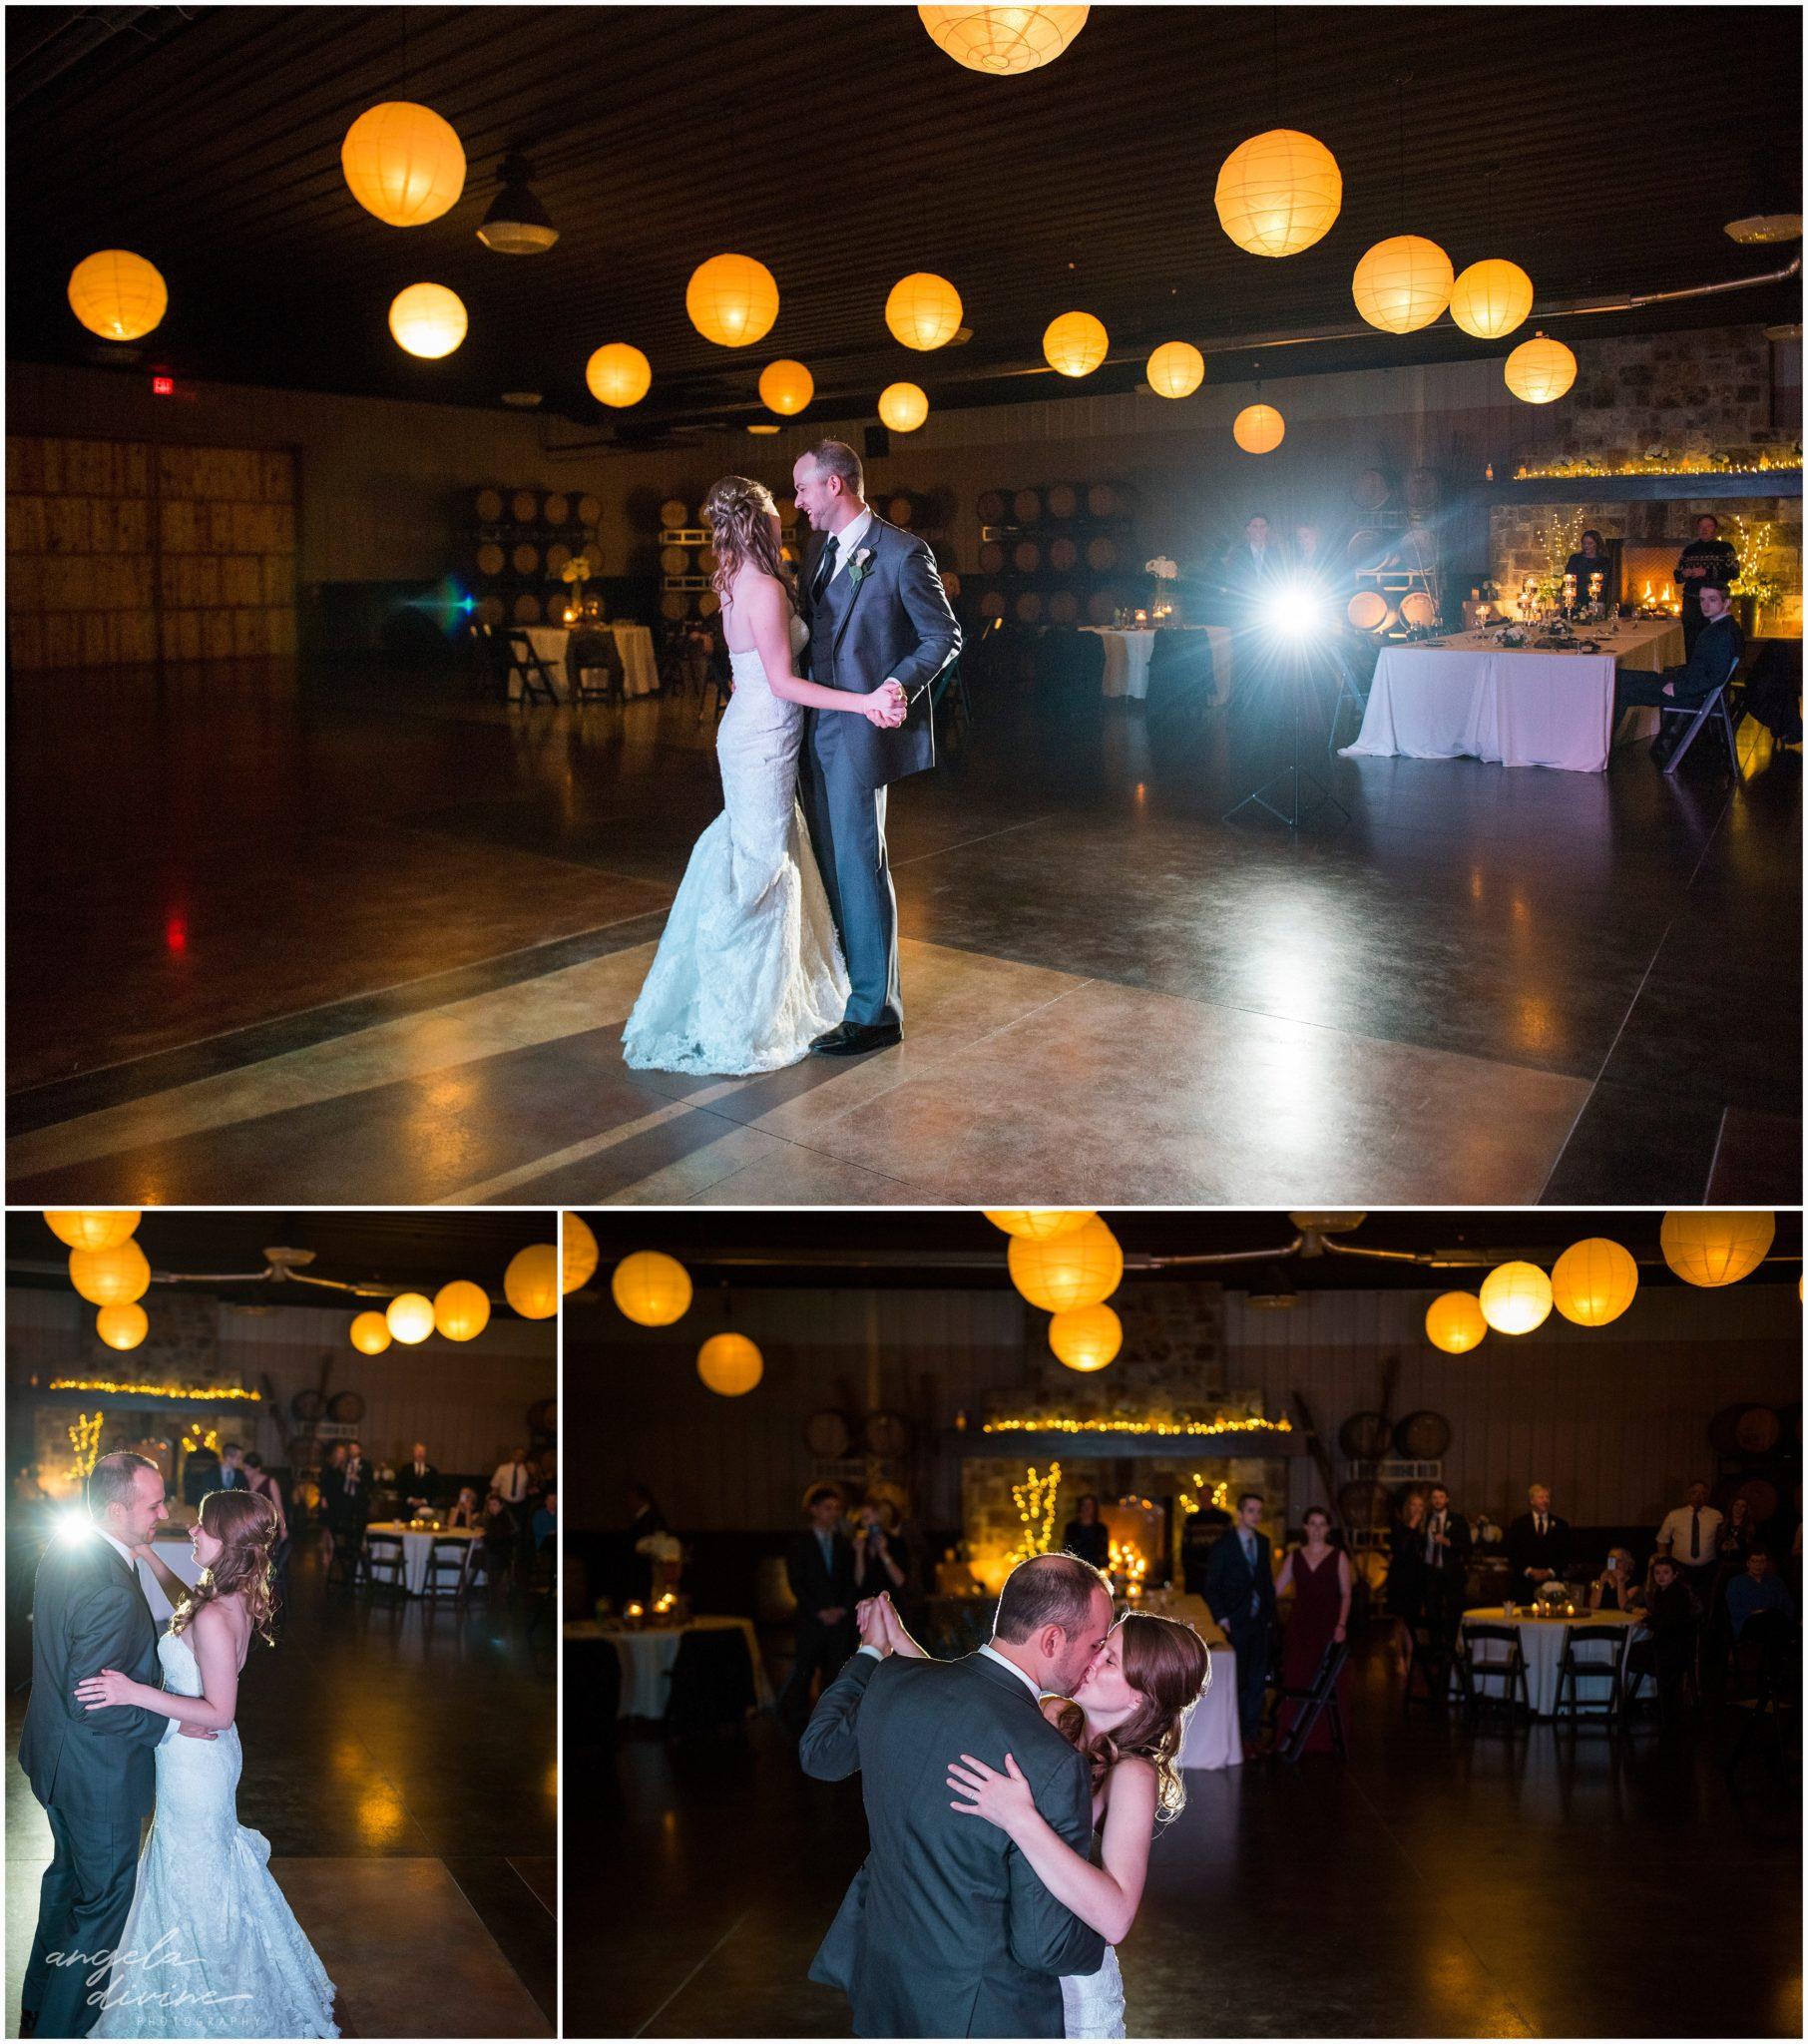 Carlos Creek Winery wedding first dance